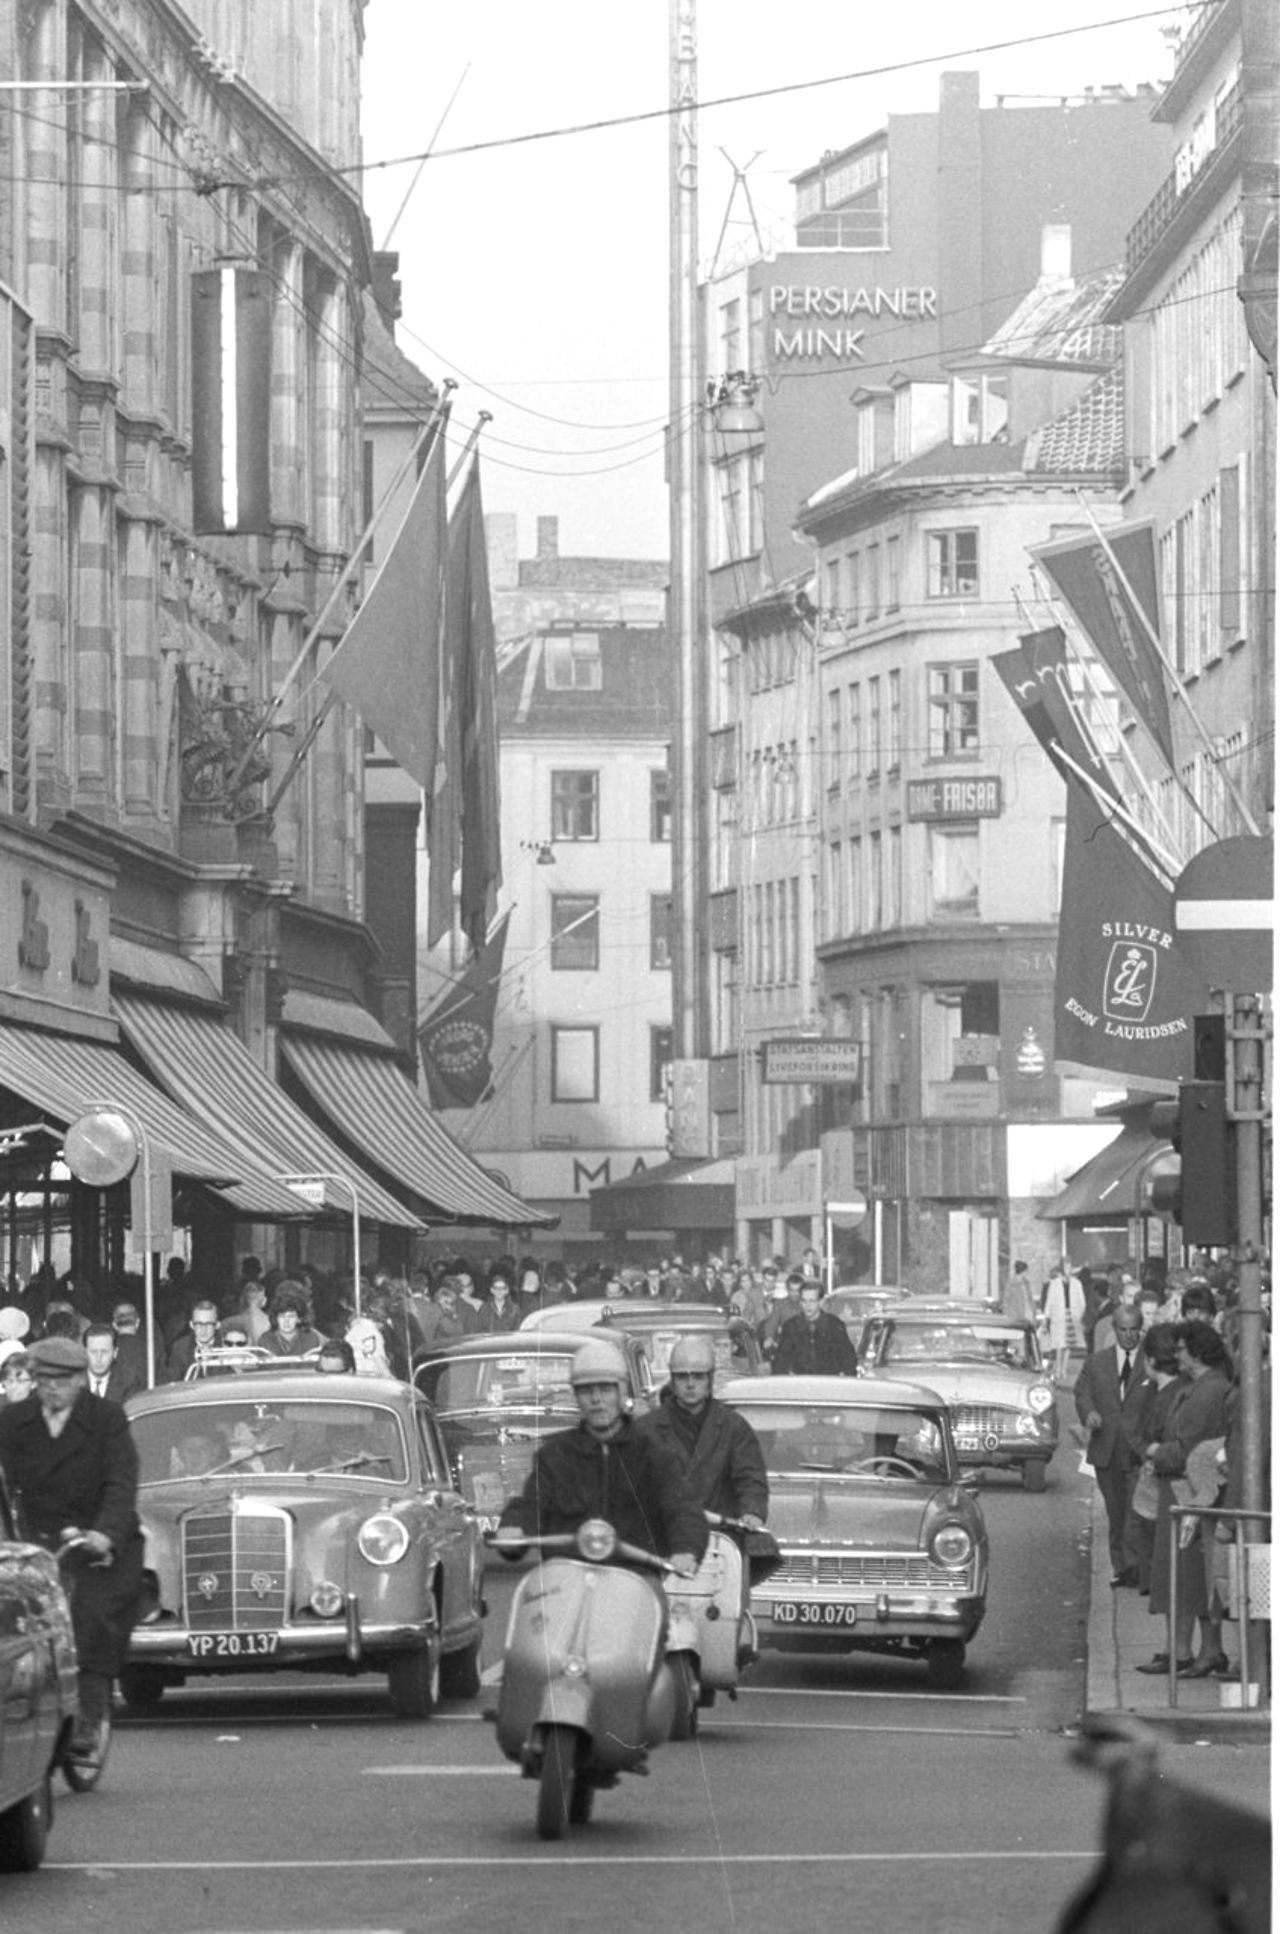 Pin Pa Old Denmark